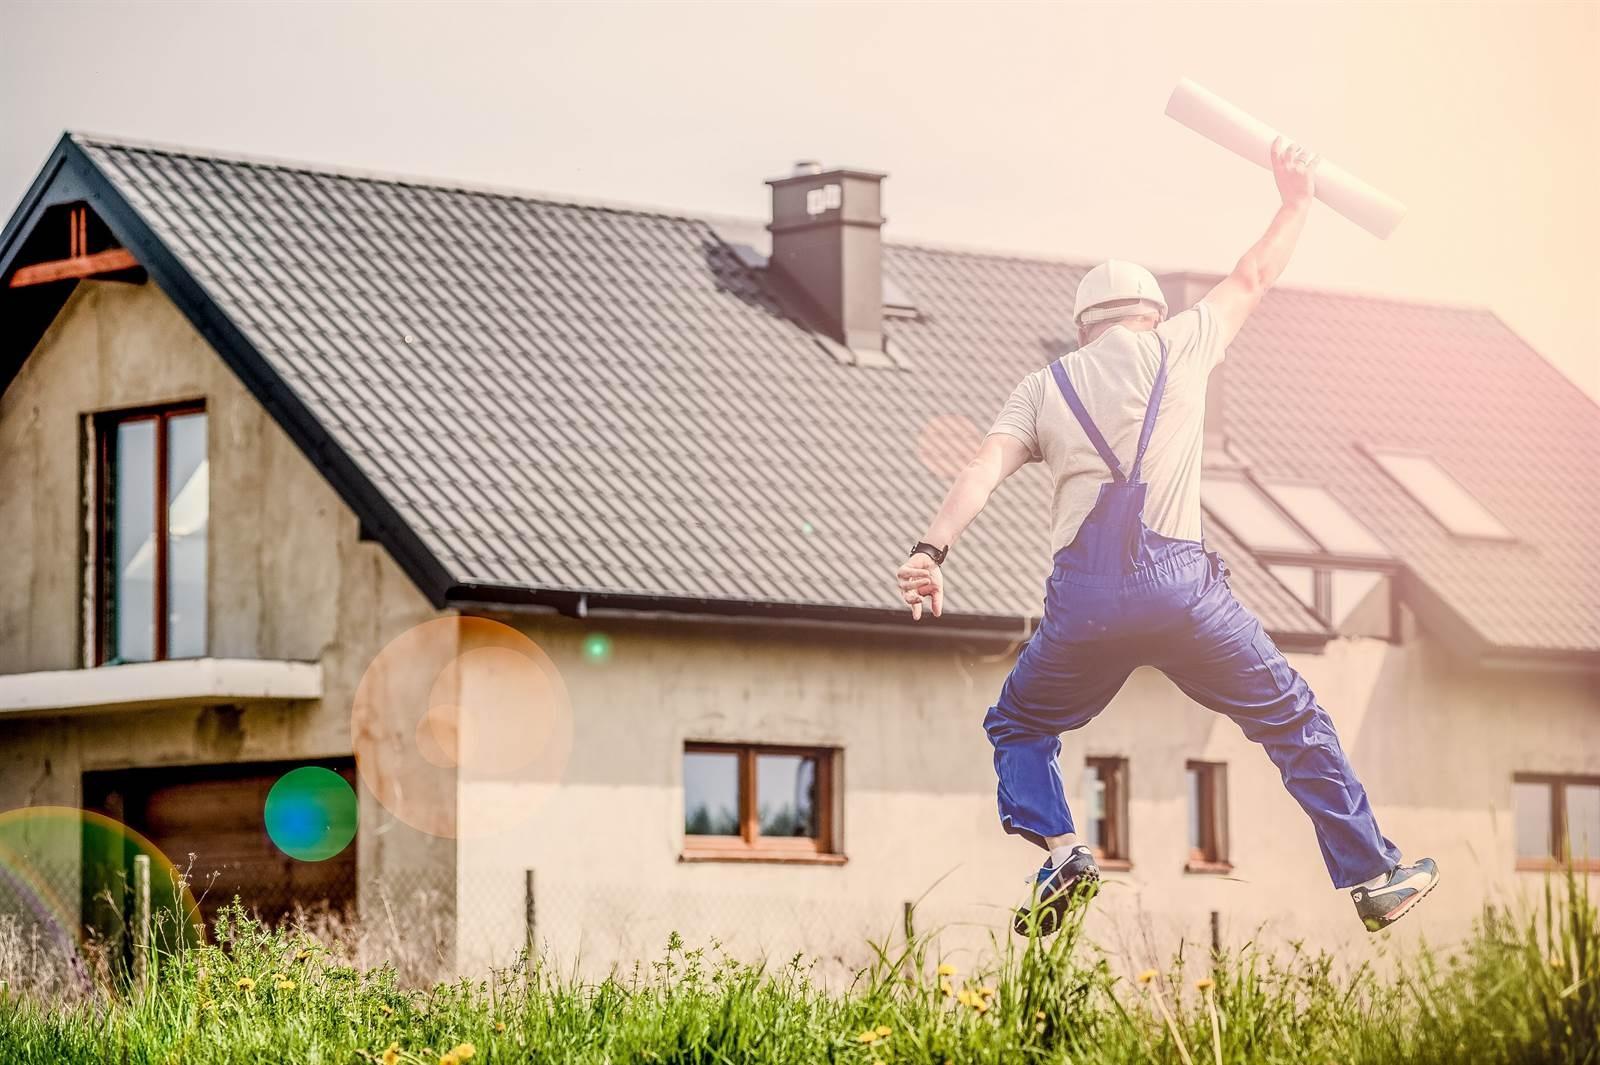 Household Maintenance Works Where Choosing Handymen is Best